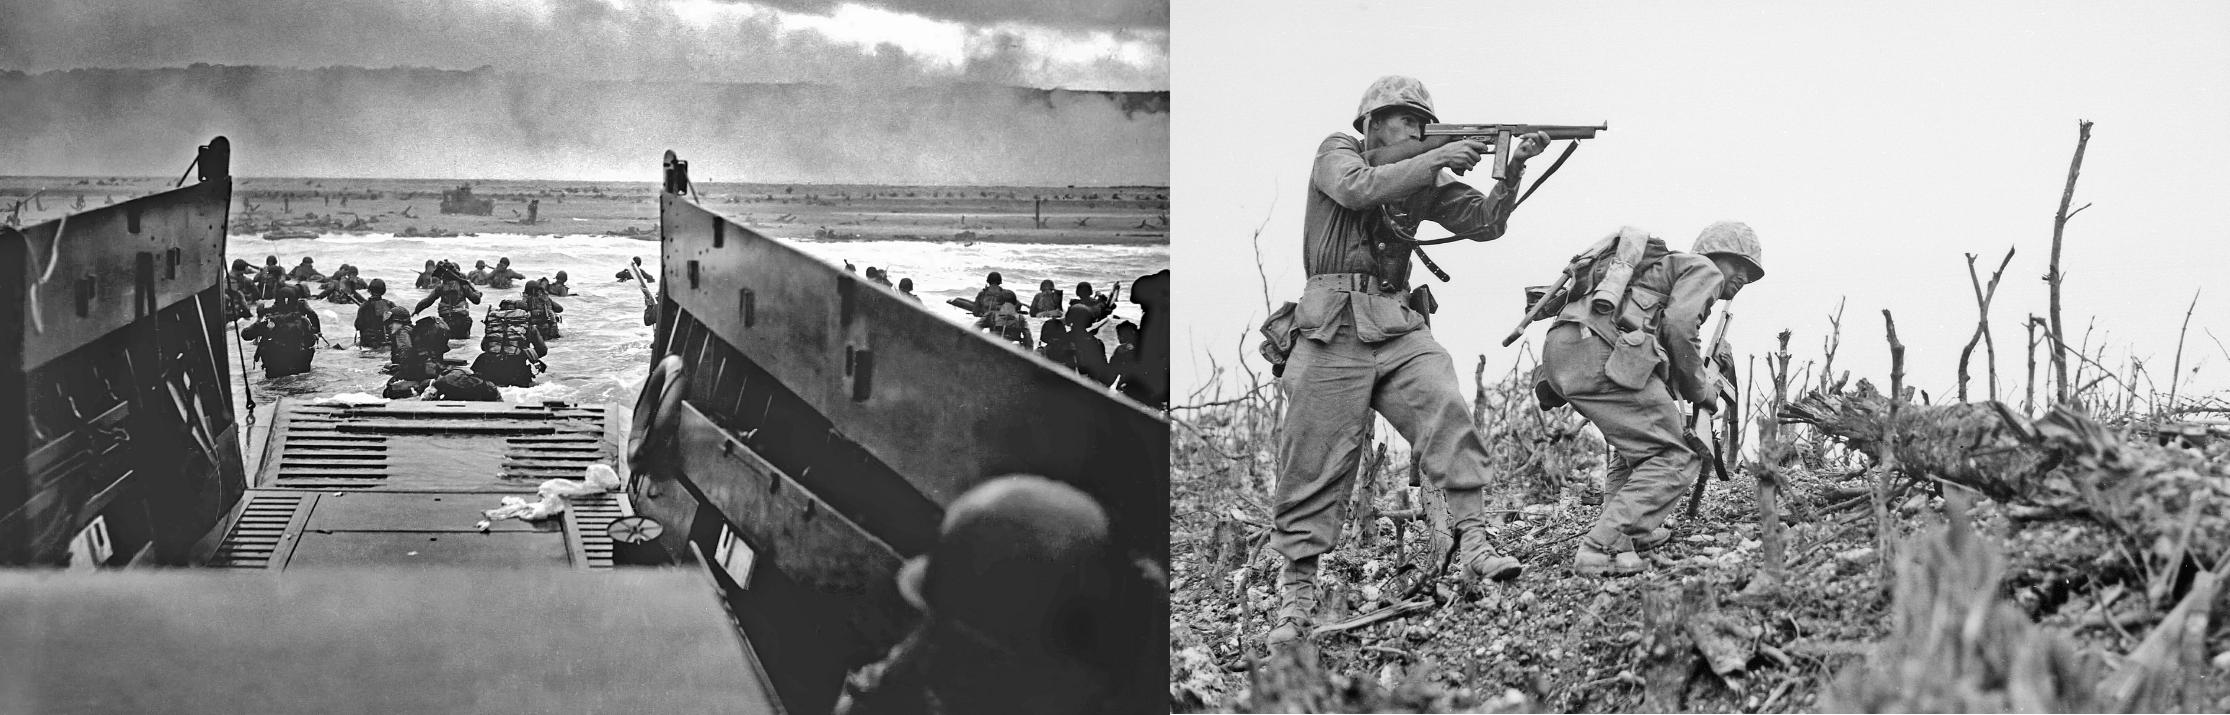 US WW2 repro